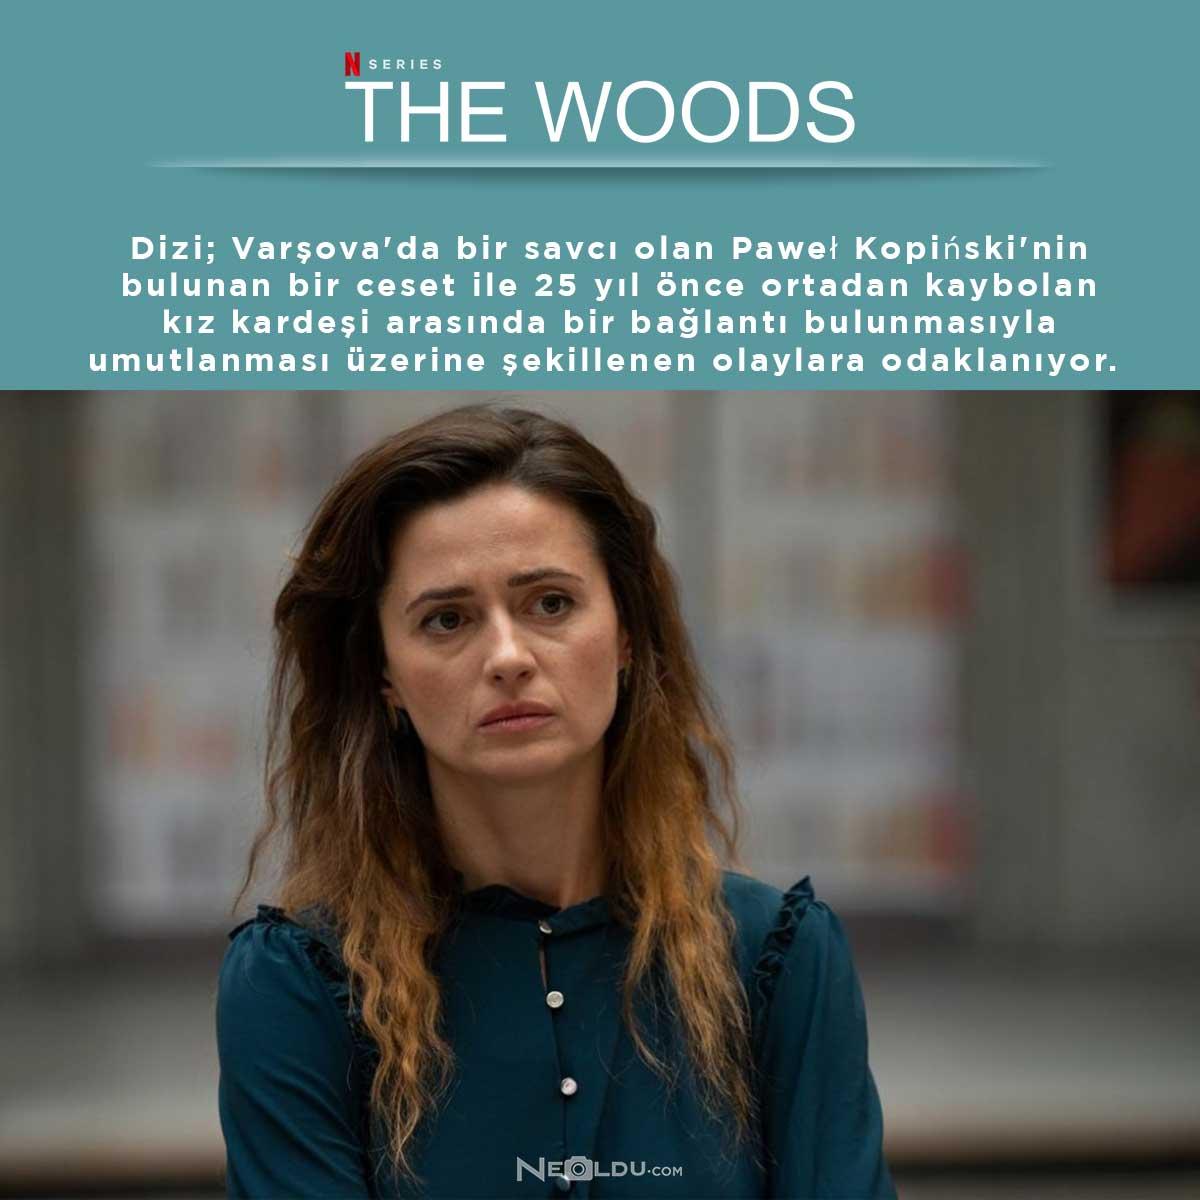 the-woods-dizisi-hakkinda-bilgi.jpg